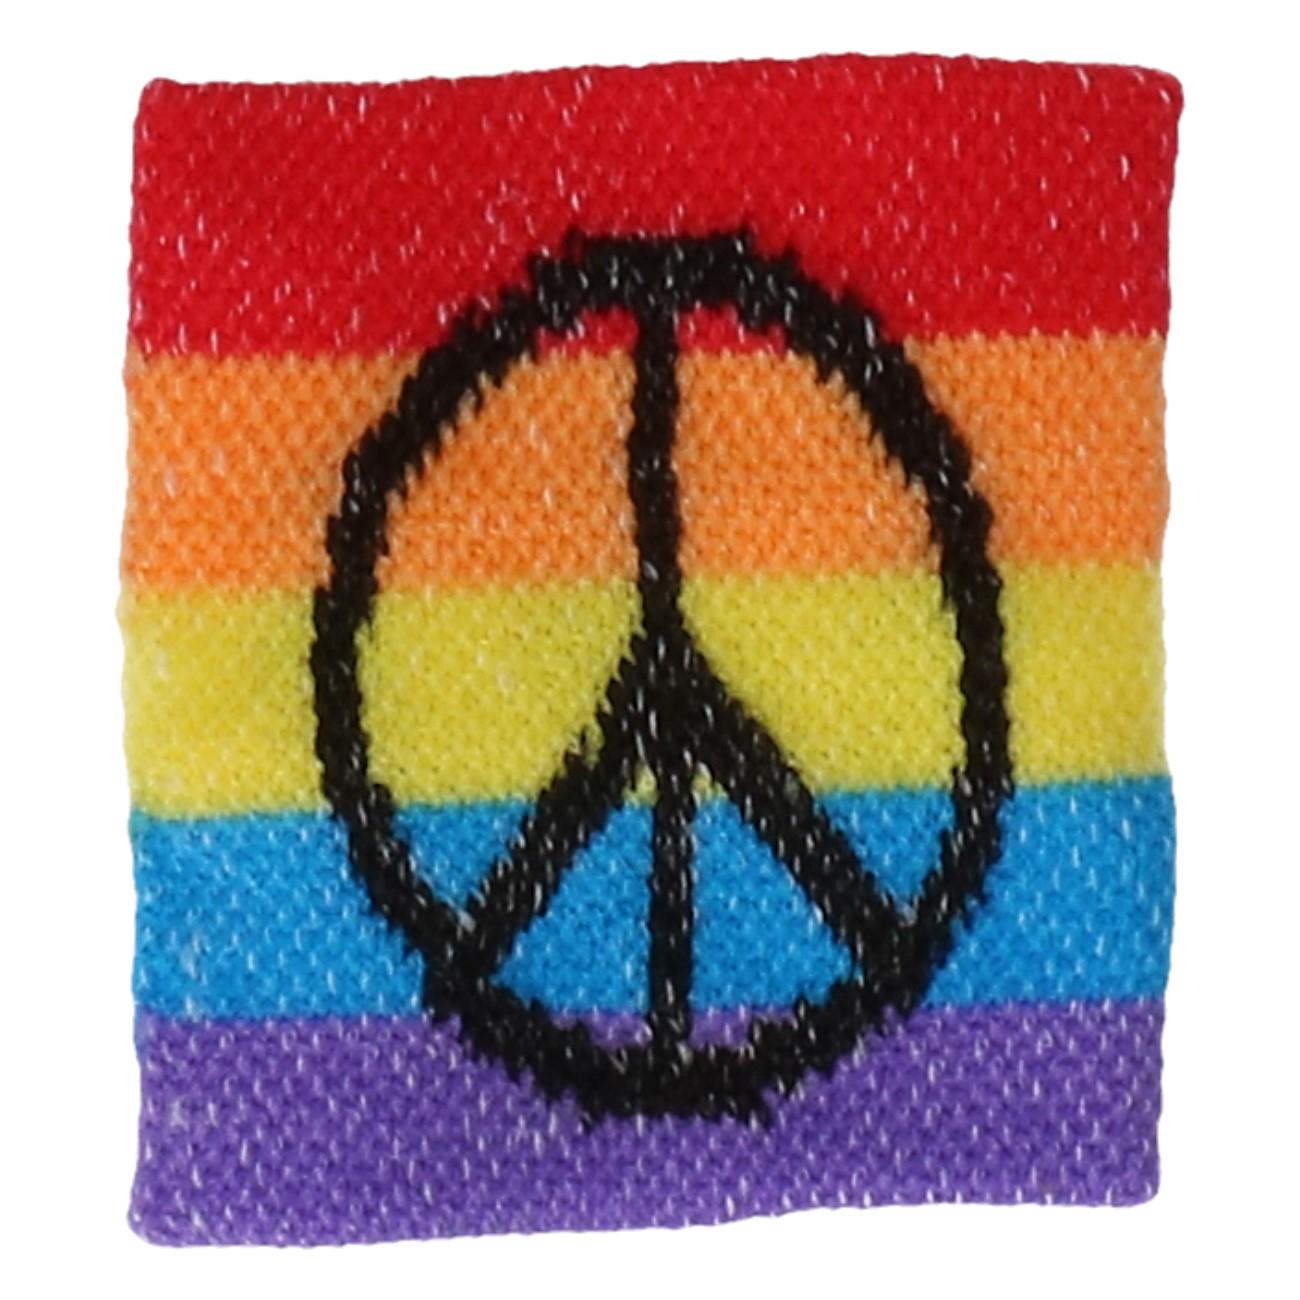 Zweetbandje rasta of peace